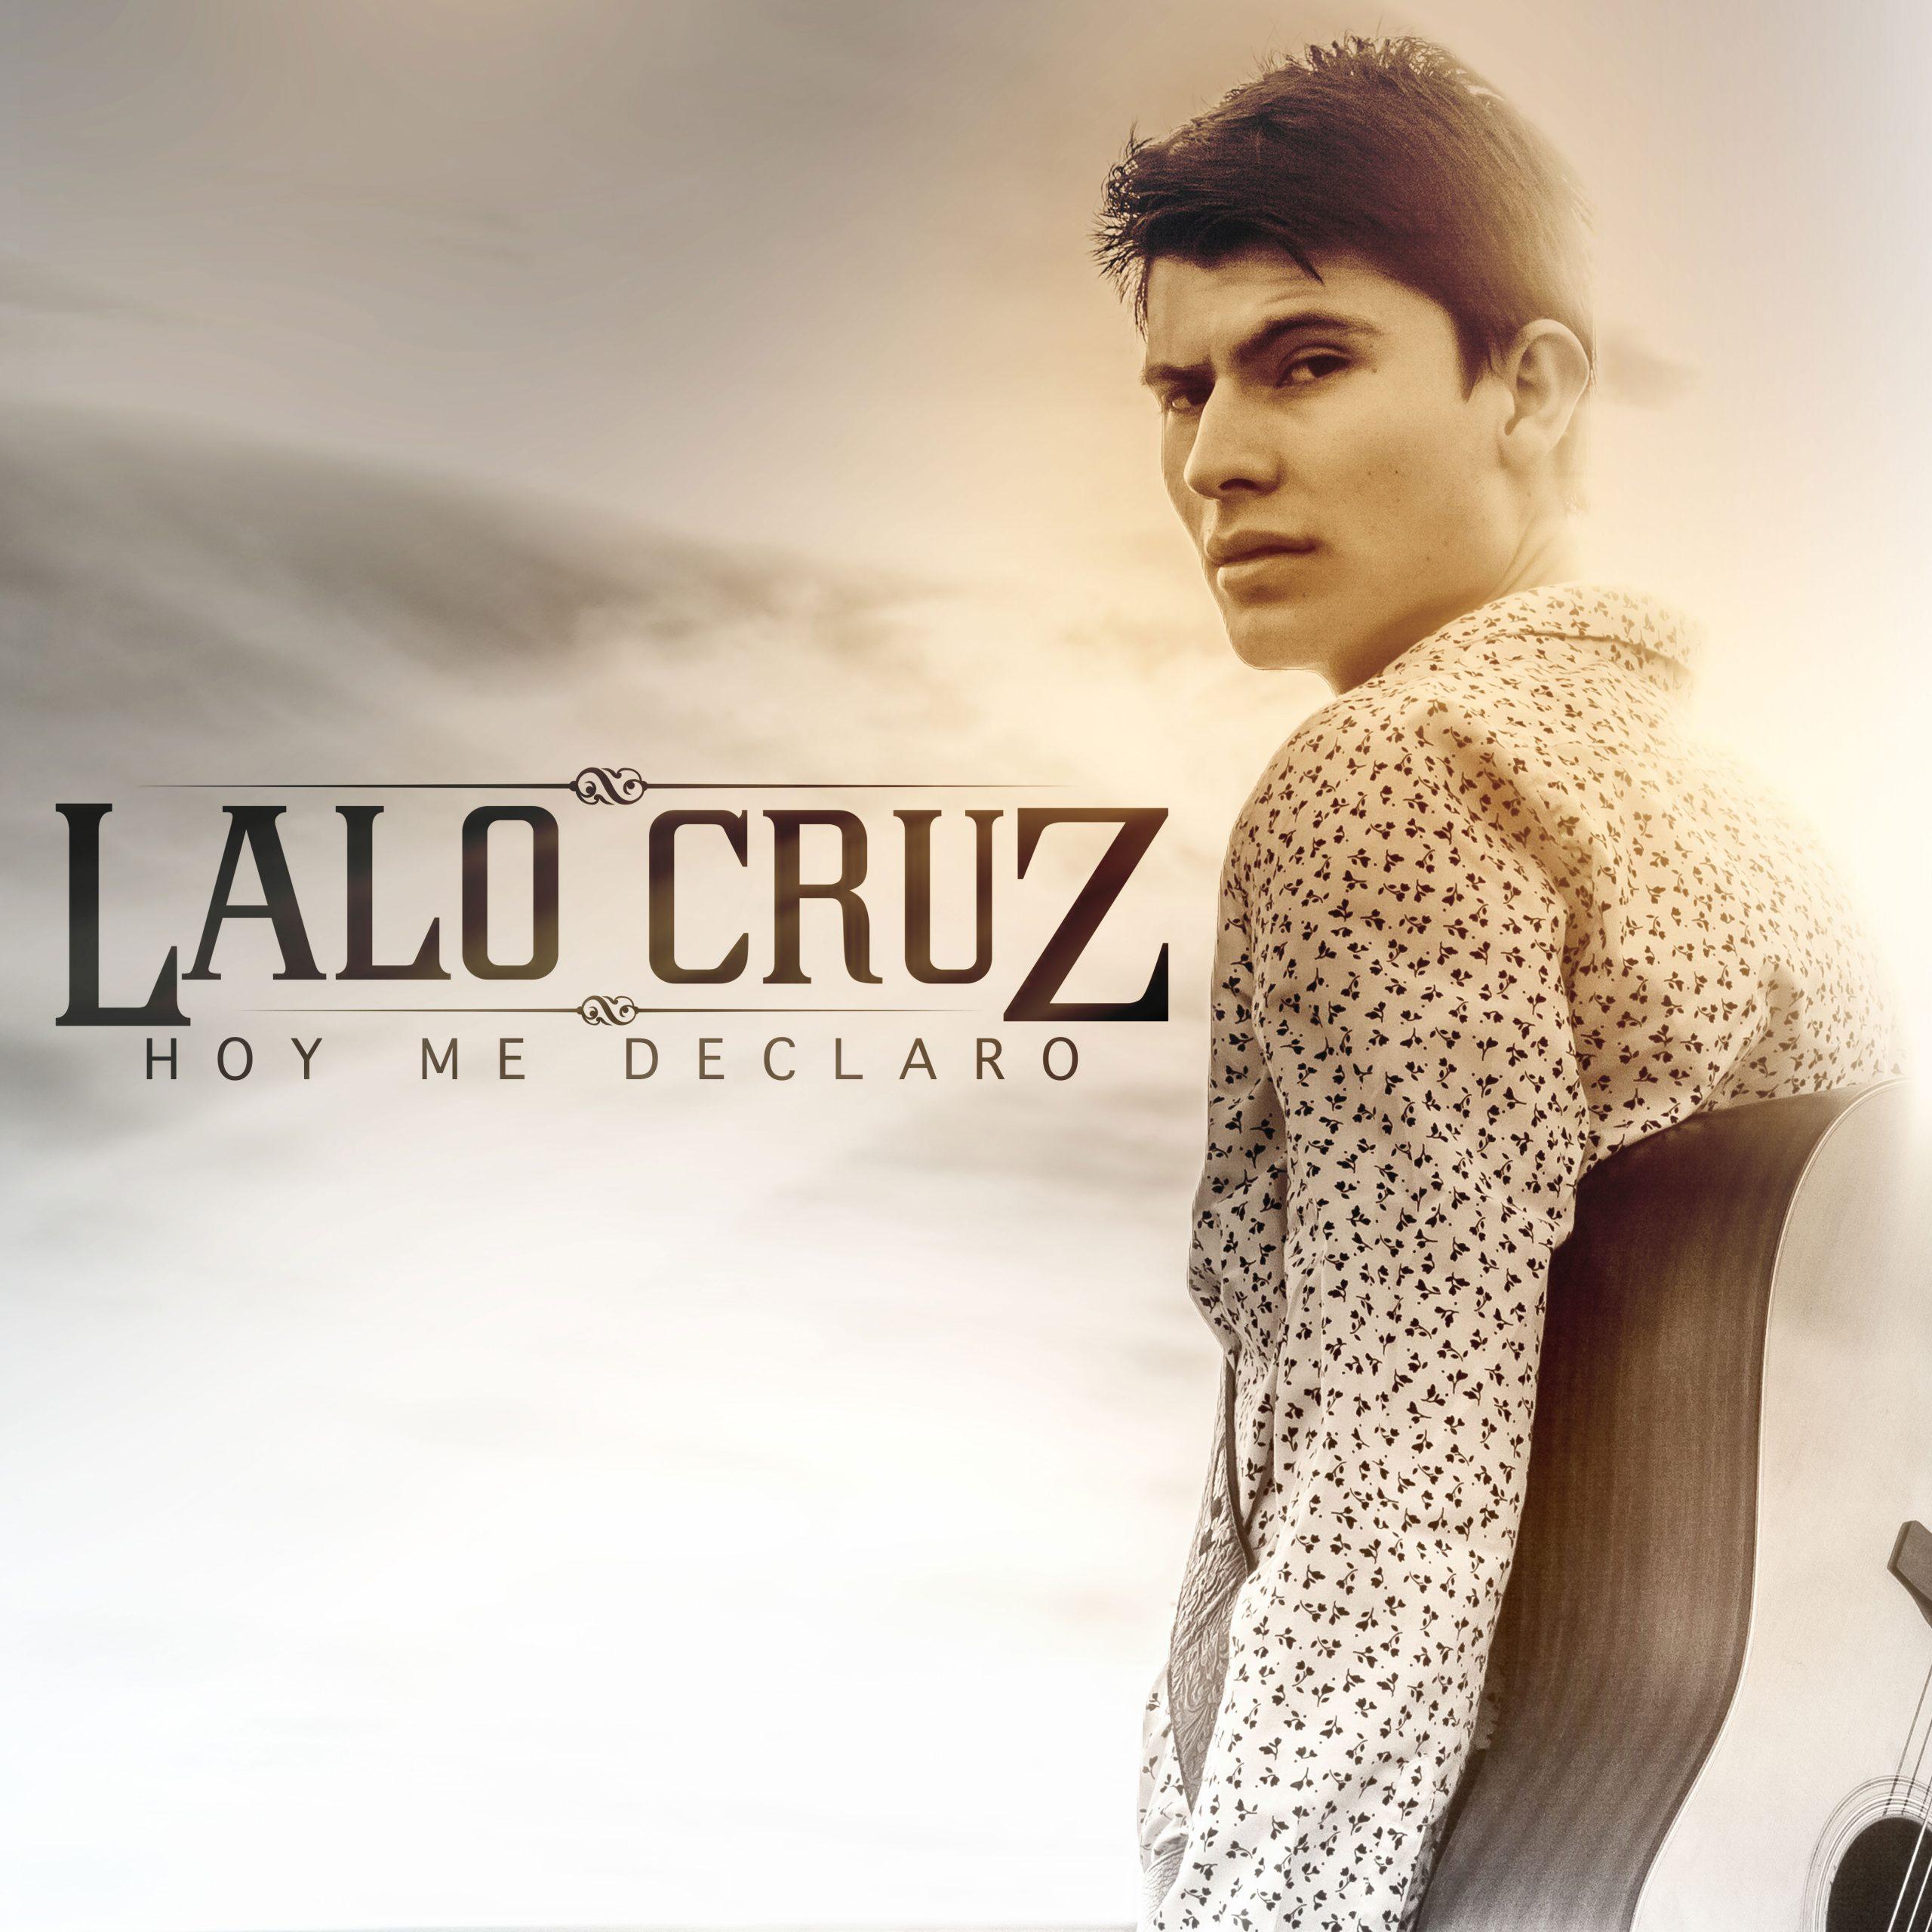 LaloCruz_HoyMeDeclaro_Cover